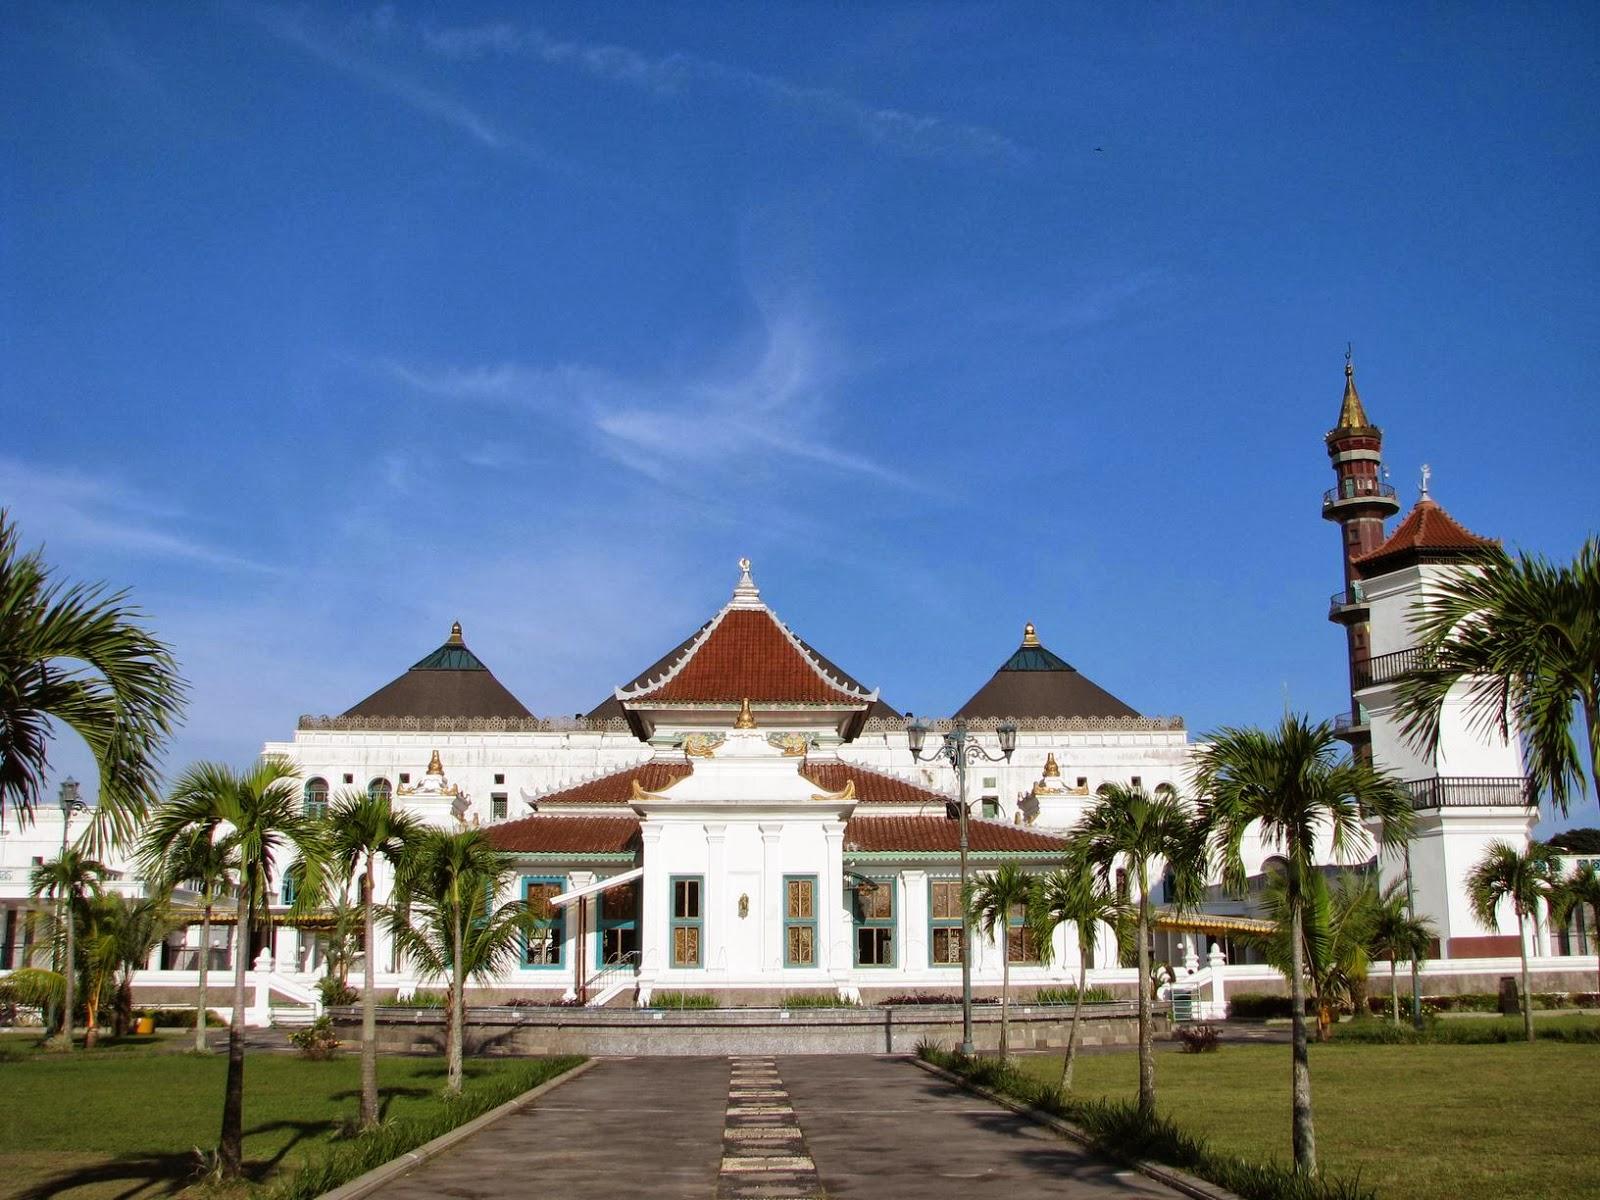 Wisata Kota Palembang Selamat Datang Jeme Semende Masjid Agung Sultan